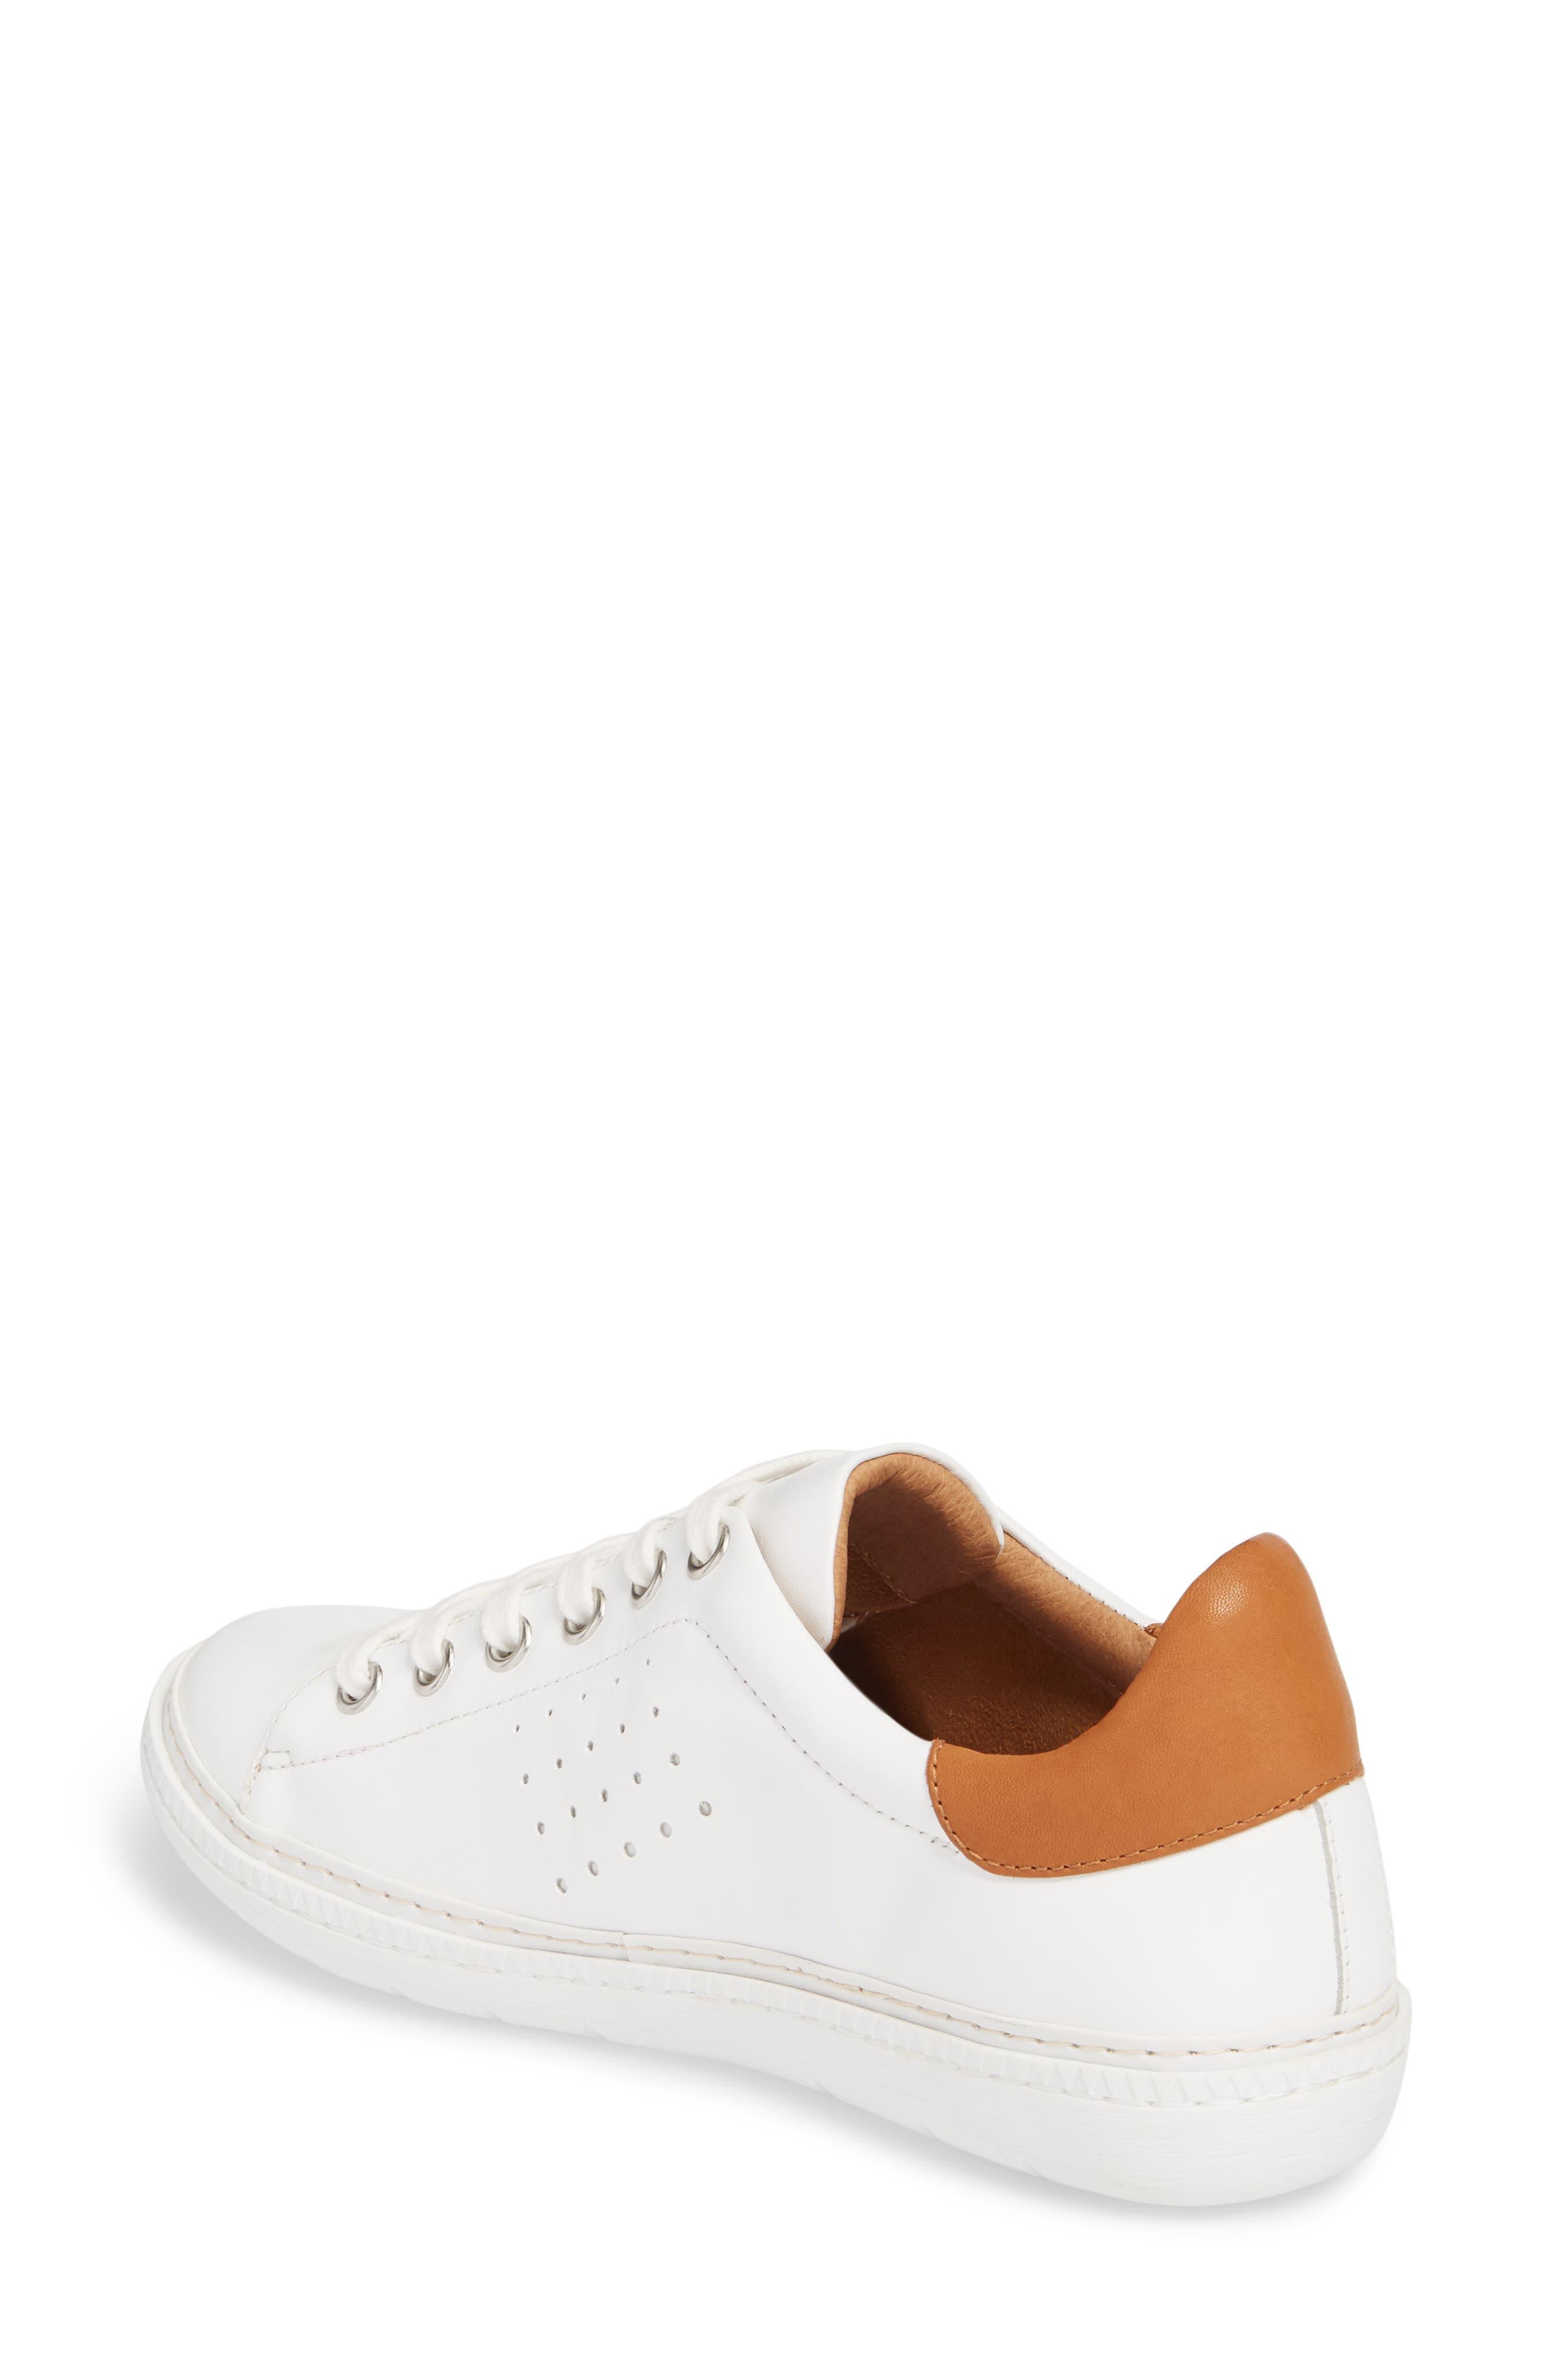 Alternate Image 2  - Söfft Arianna Sneaker (Women)